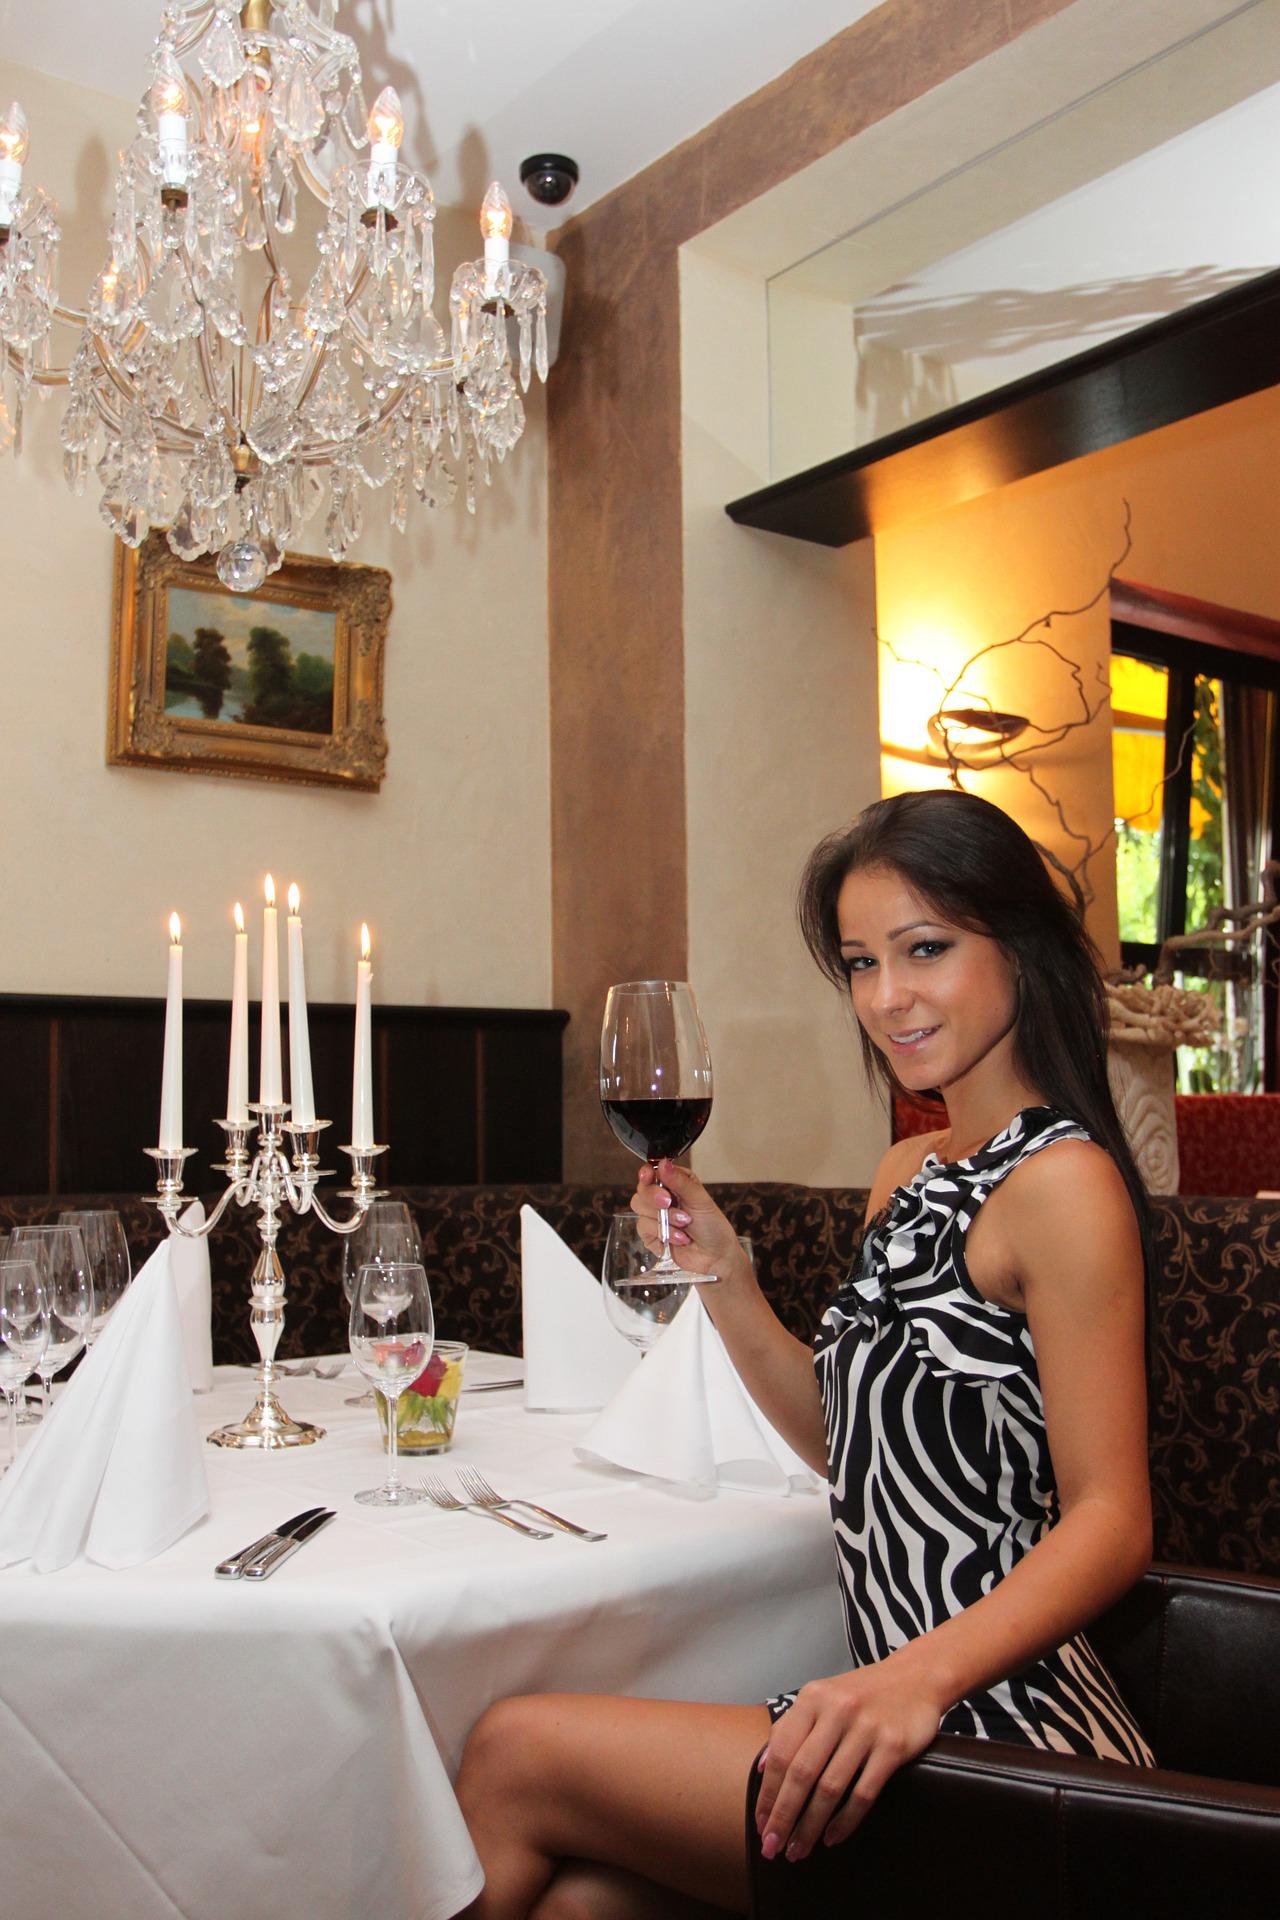 restaurant-1248735_1920